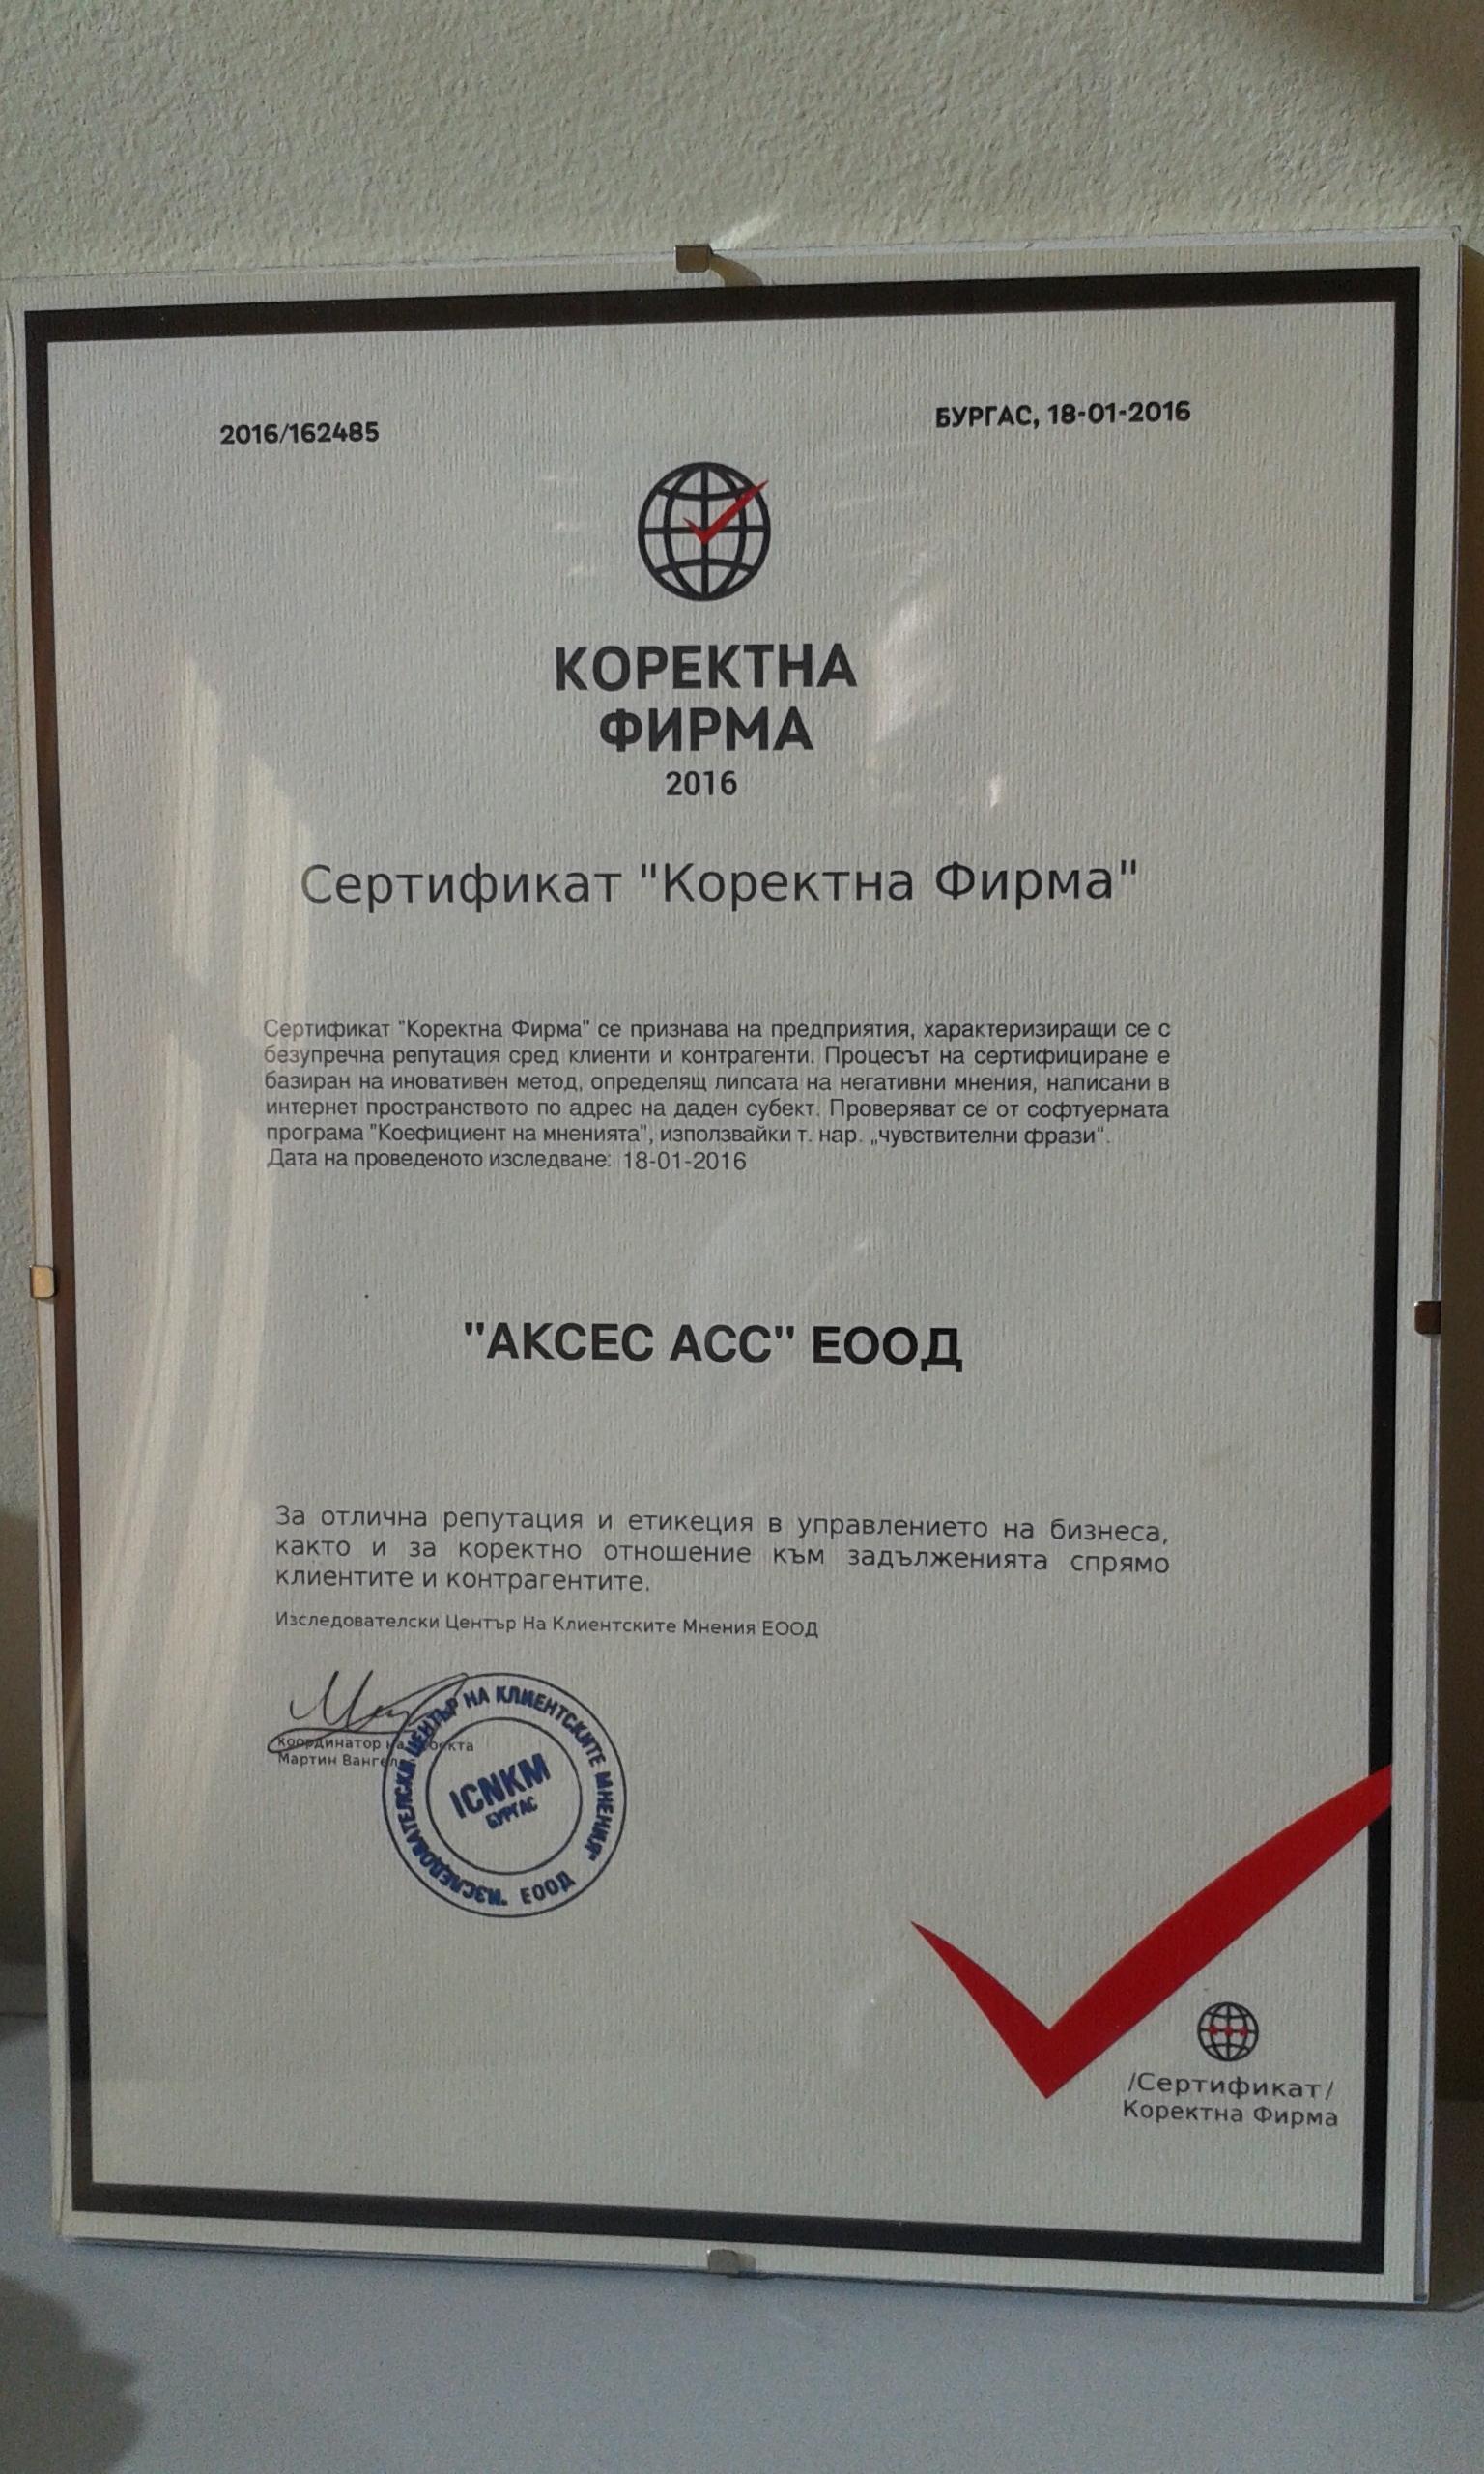 ACCESS ACC Certificat 2016